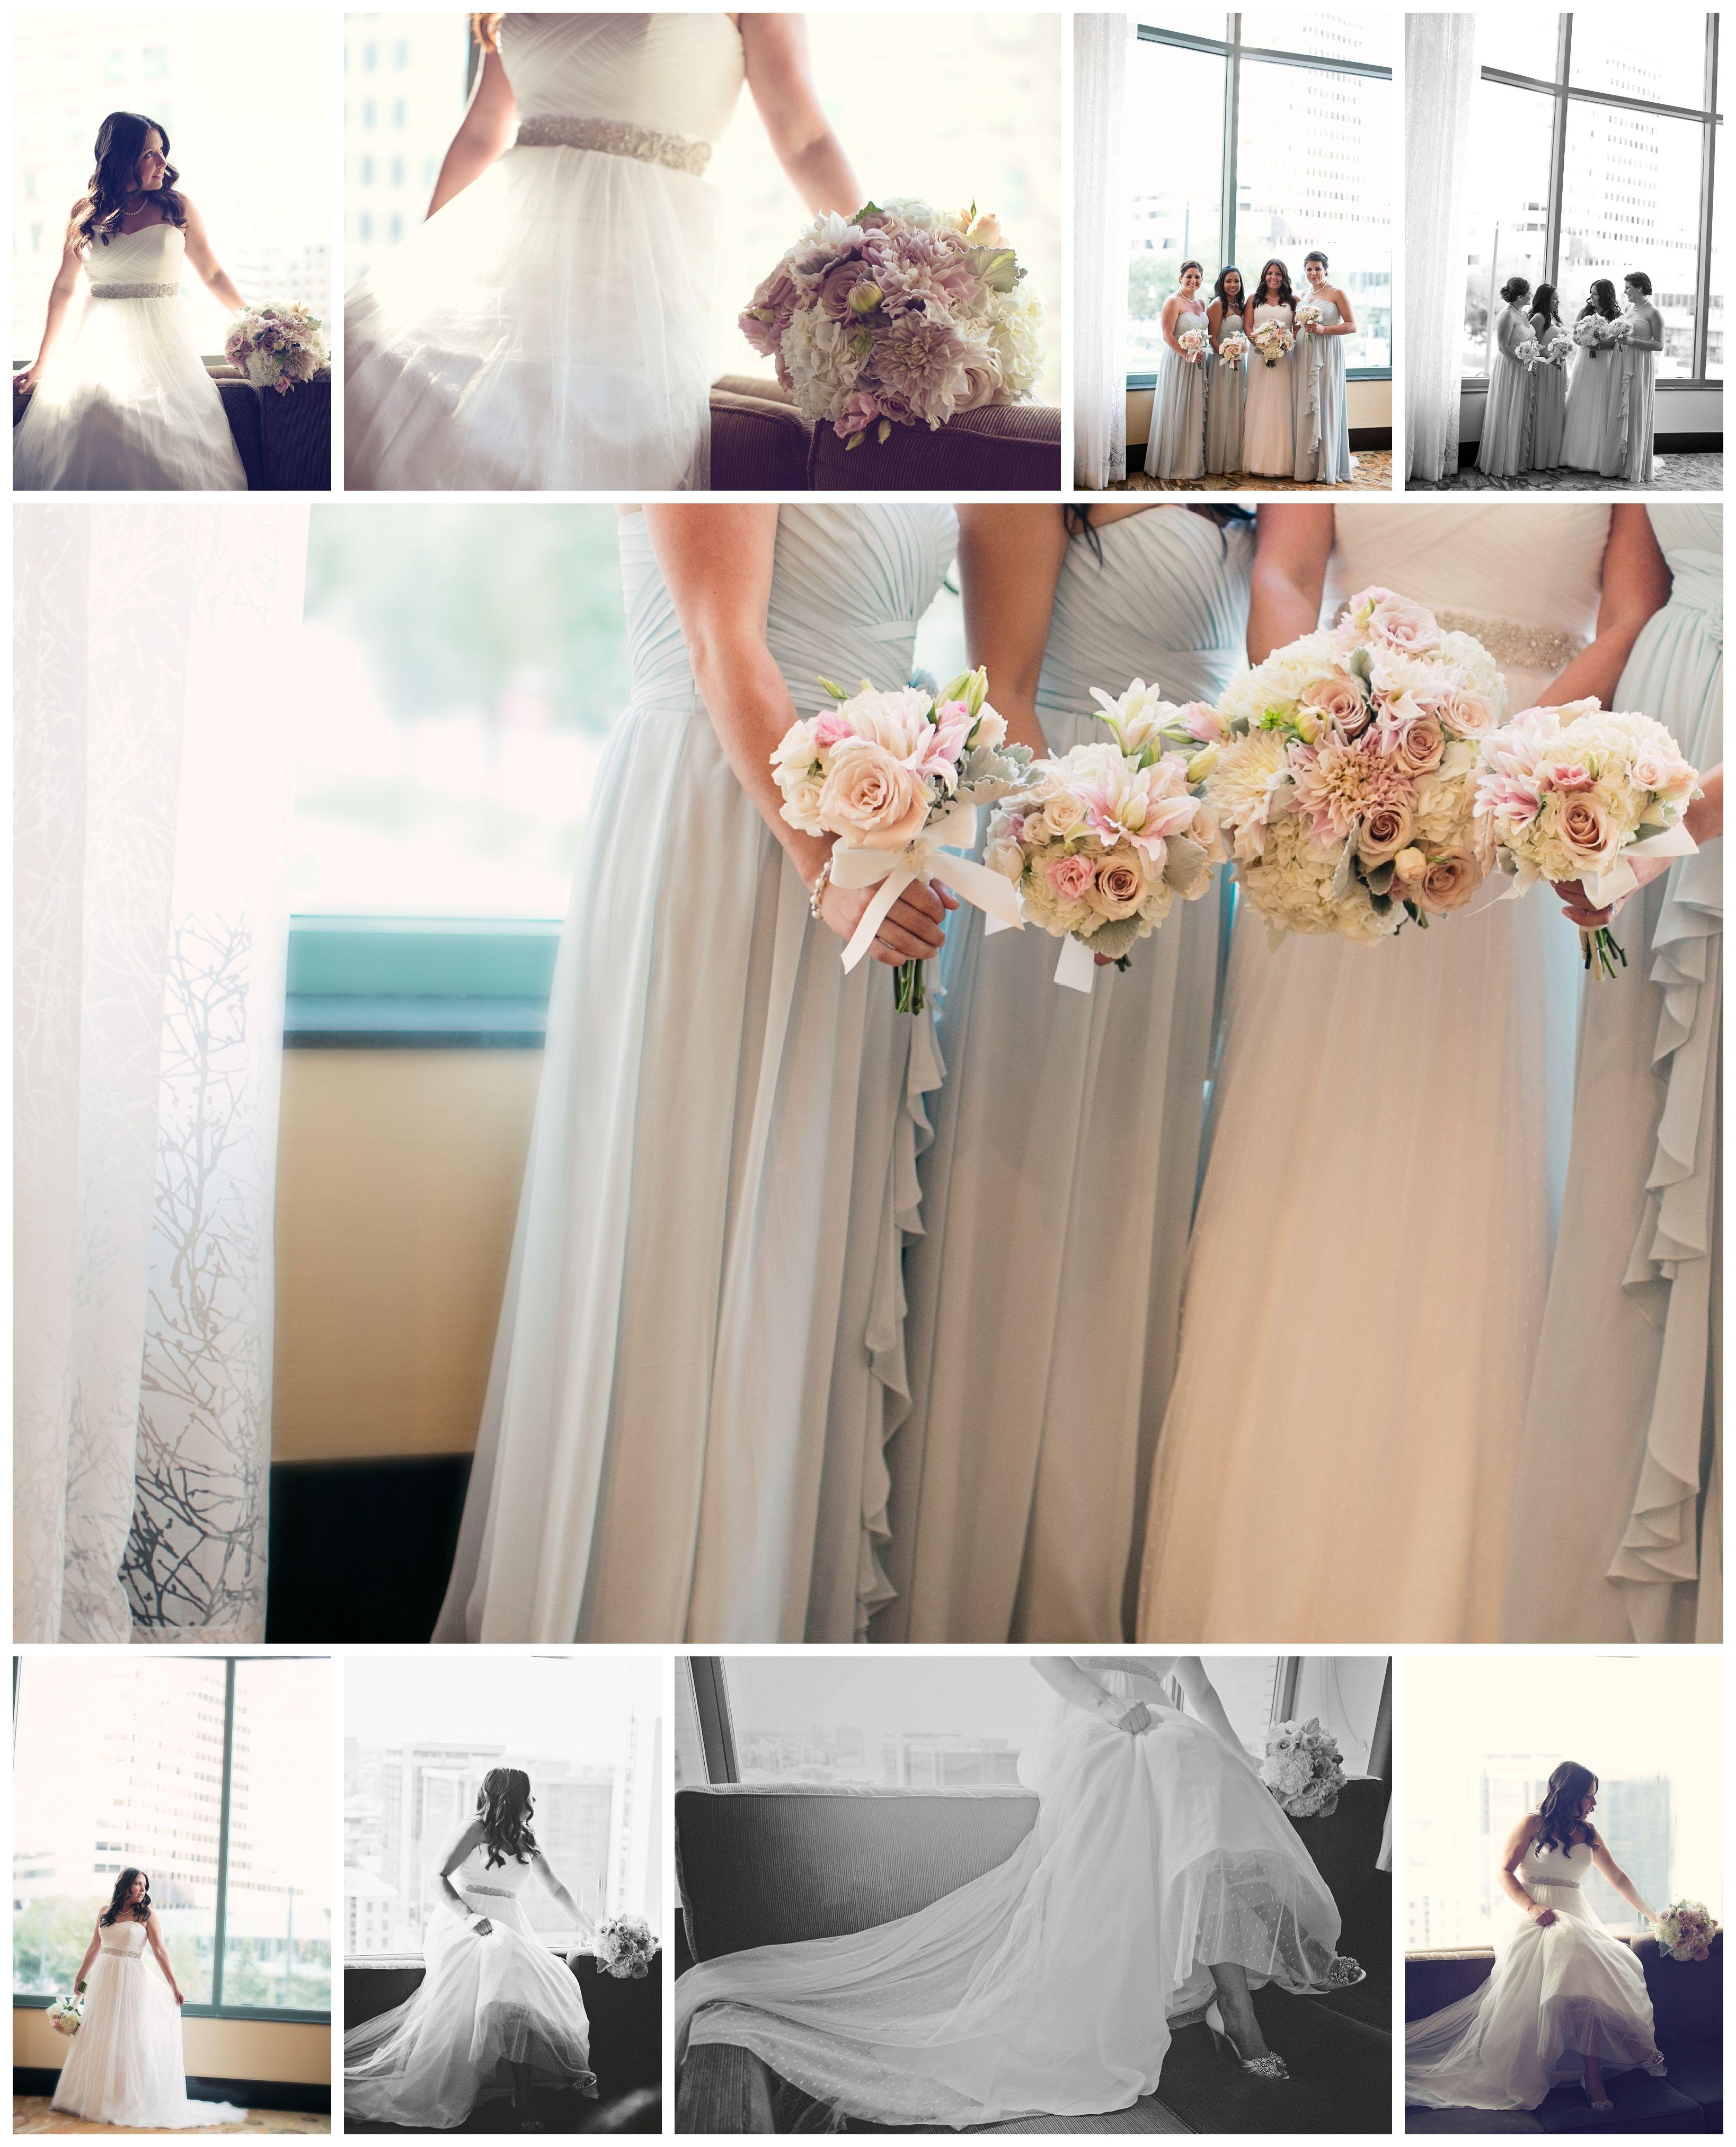 Colorado wedding photography | Bridal photos | Bridesmaids | beautiful wedding | Denver, Colorado | www.biophotographystudios.com